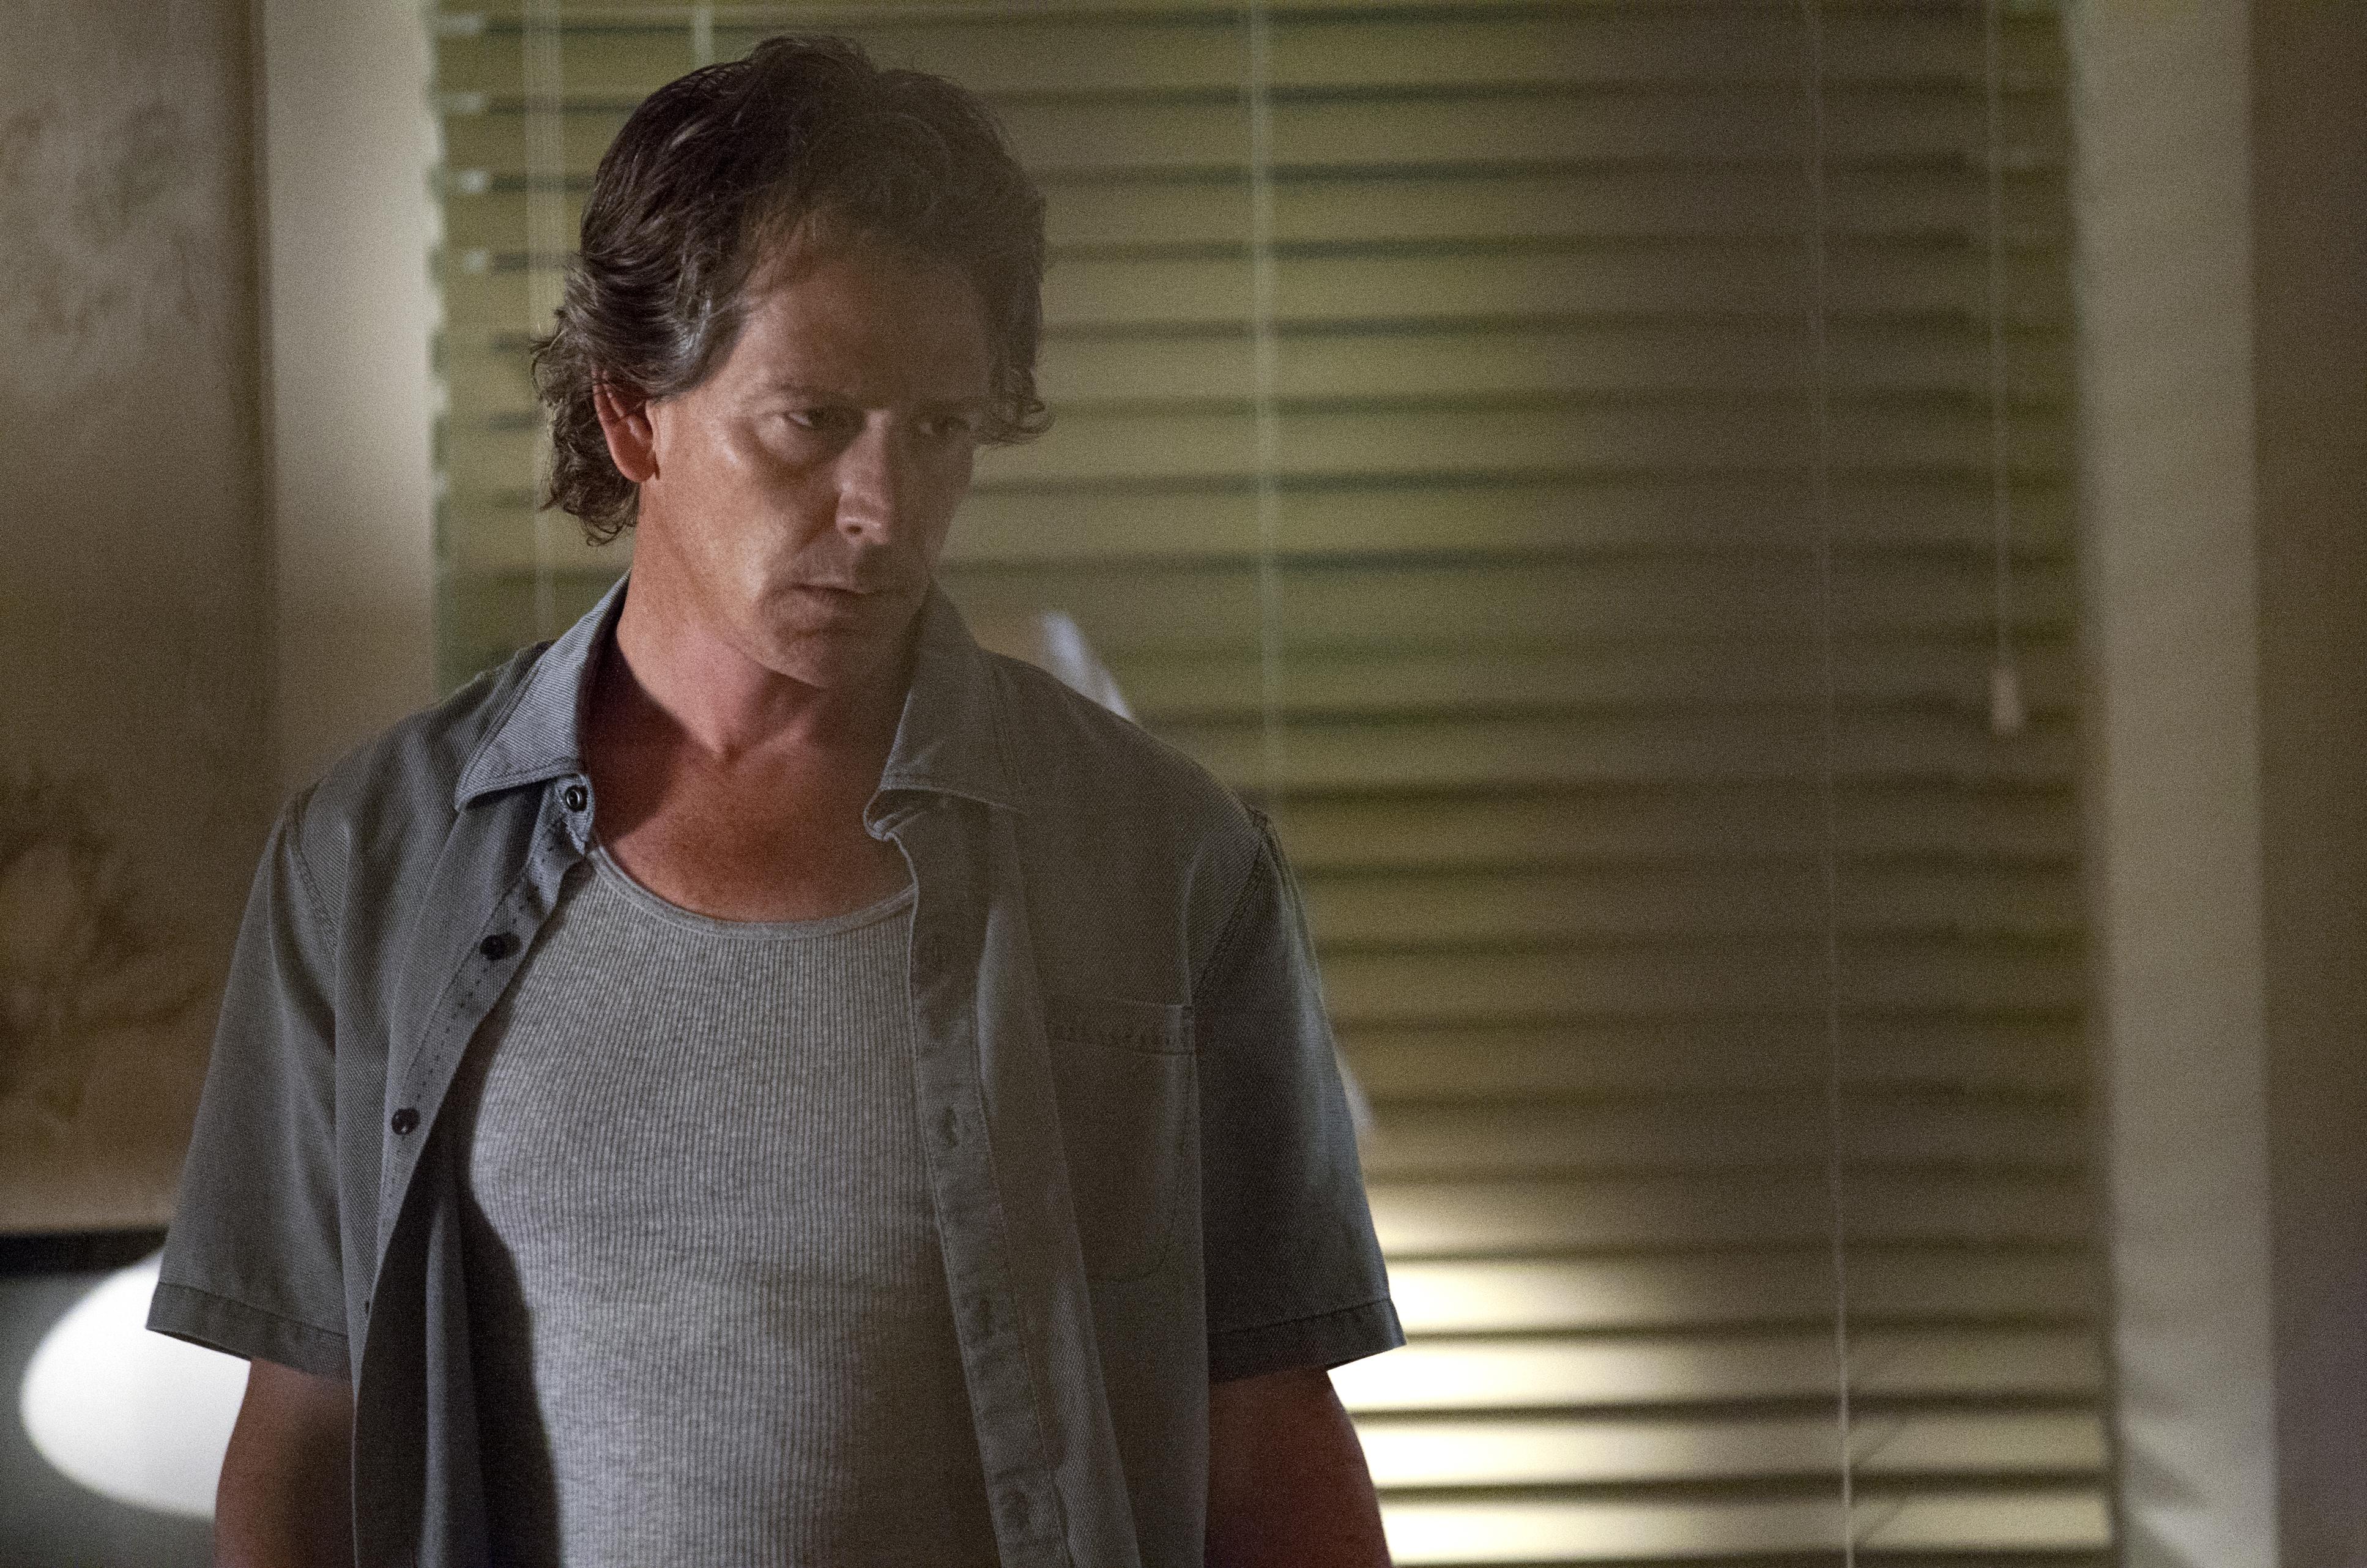 Ben Mendelsohn (Danny Rayburn) in the Netflix Original Series BLOODLINE.  Photo credit: Saeed Adyani.